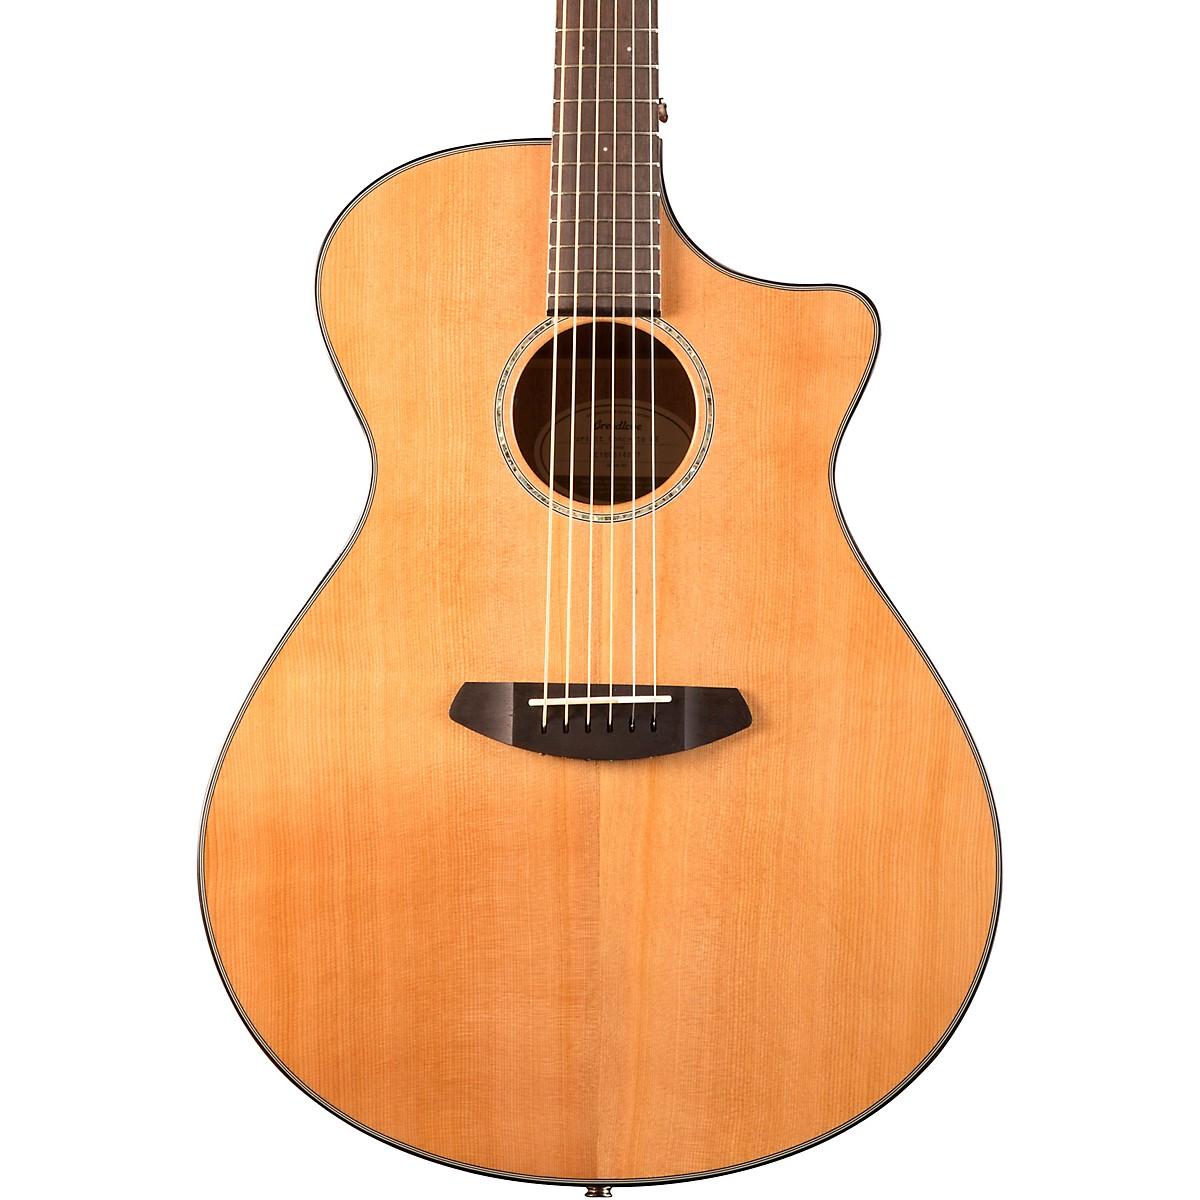 Breedlove Pursuit Concerto Red Cedar - Mahogany Acoustic-Electic Guitar